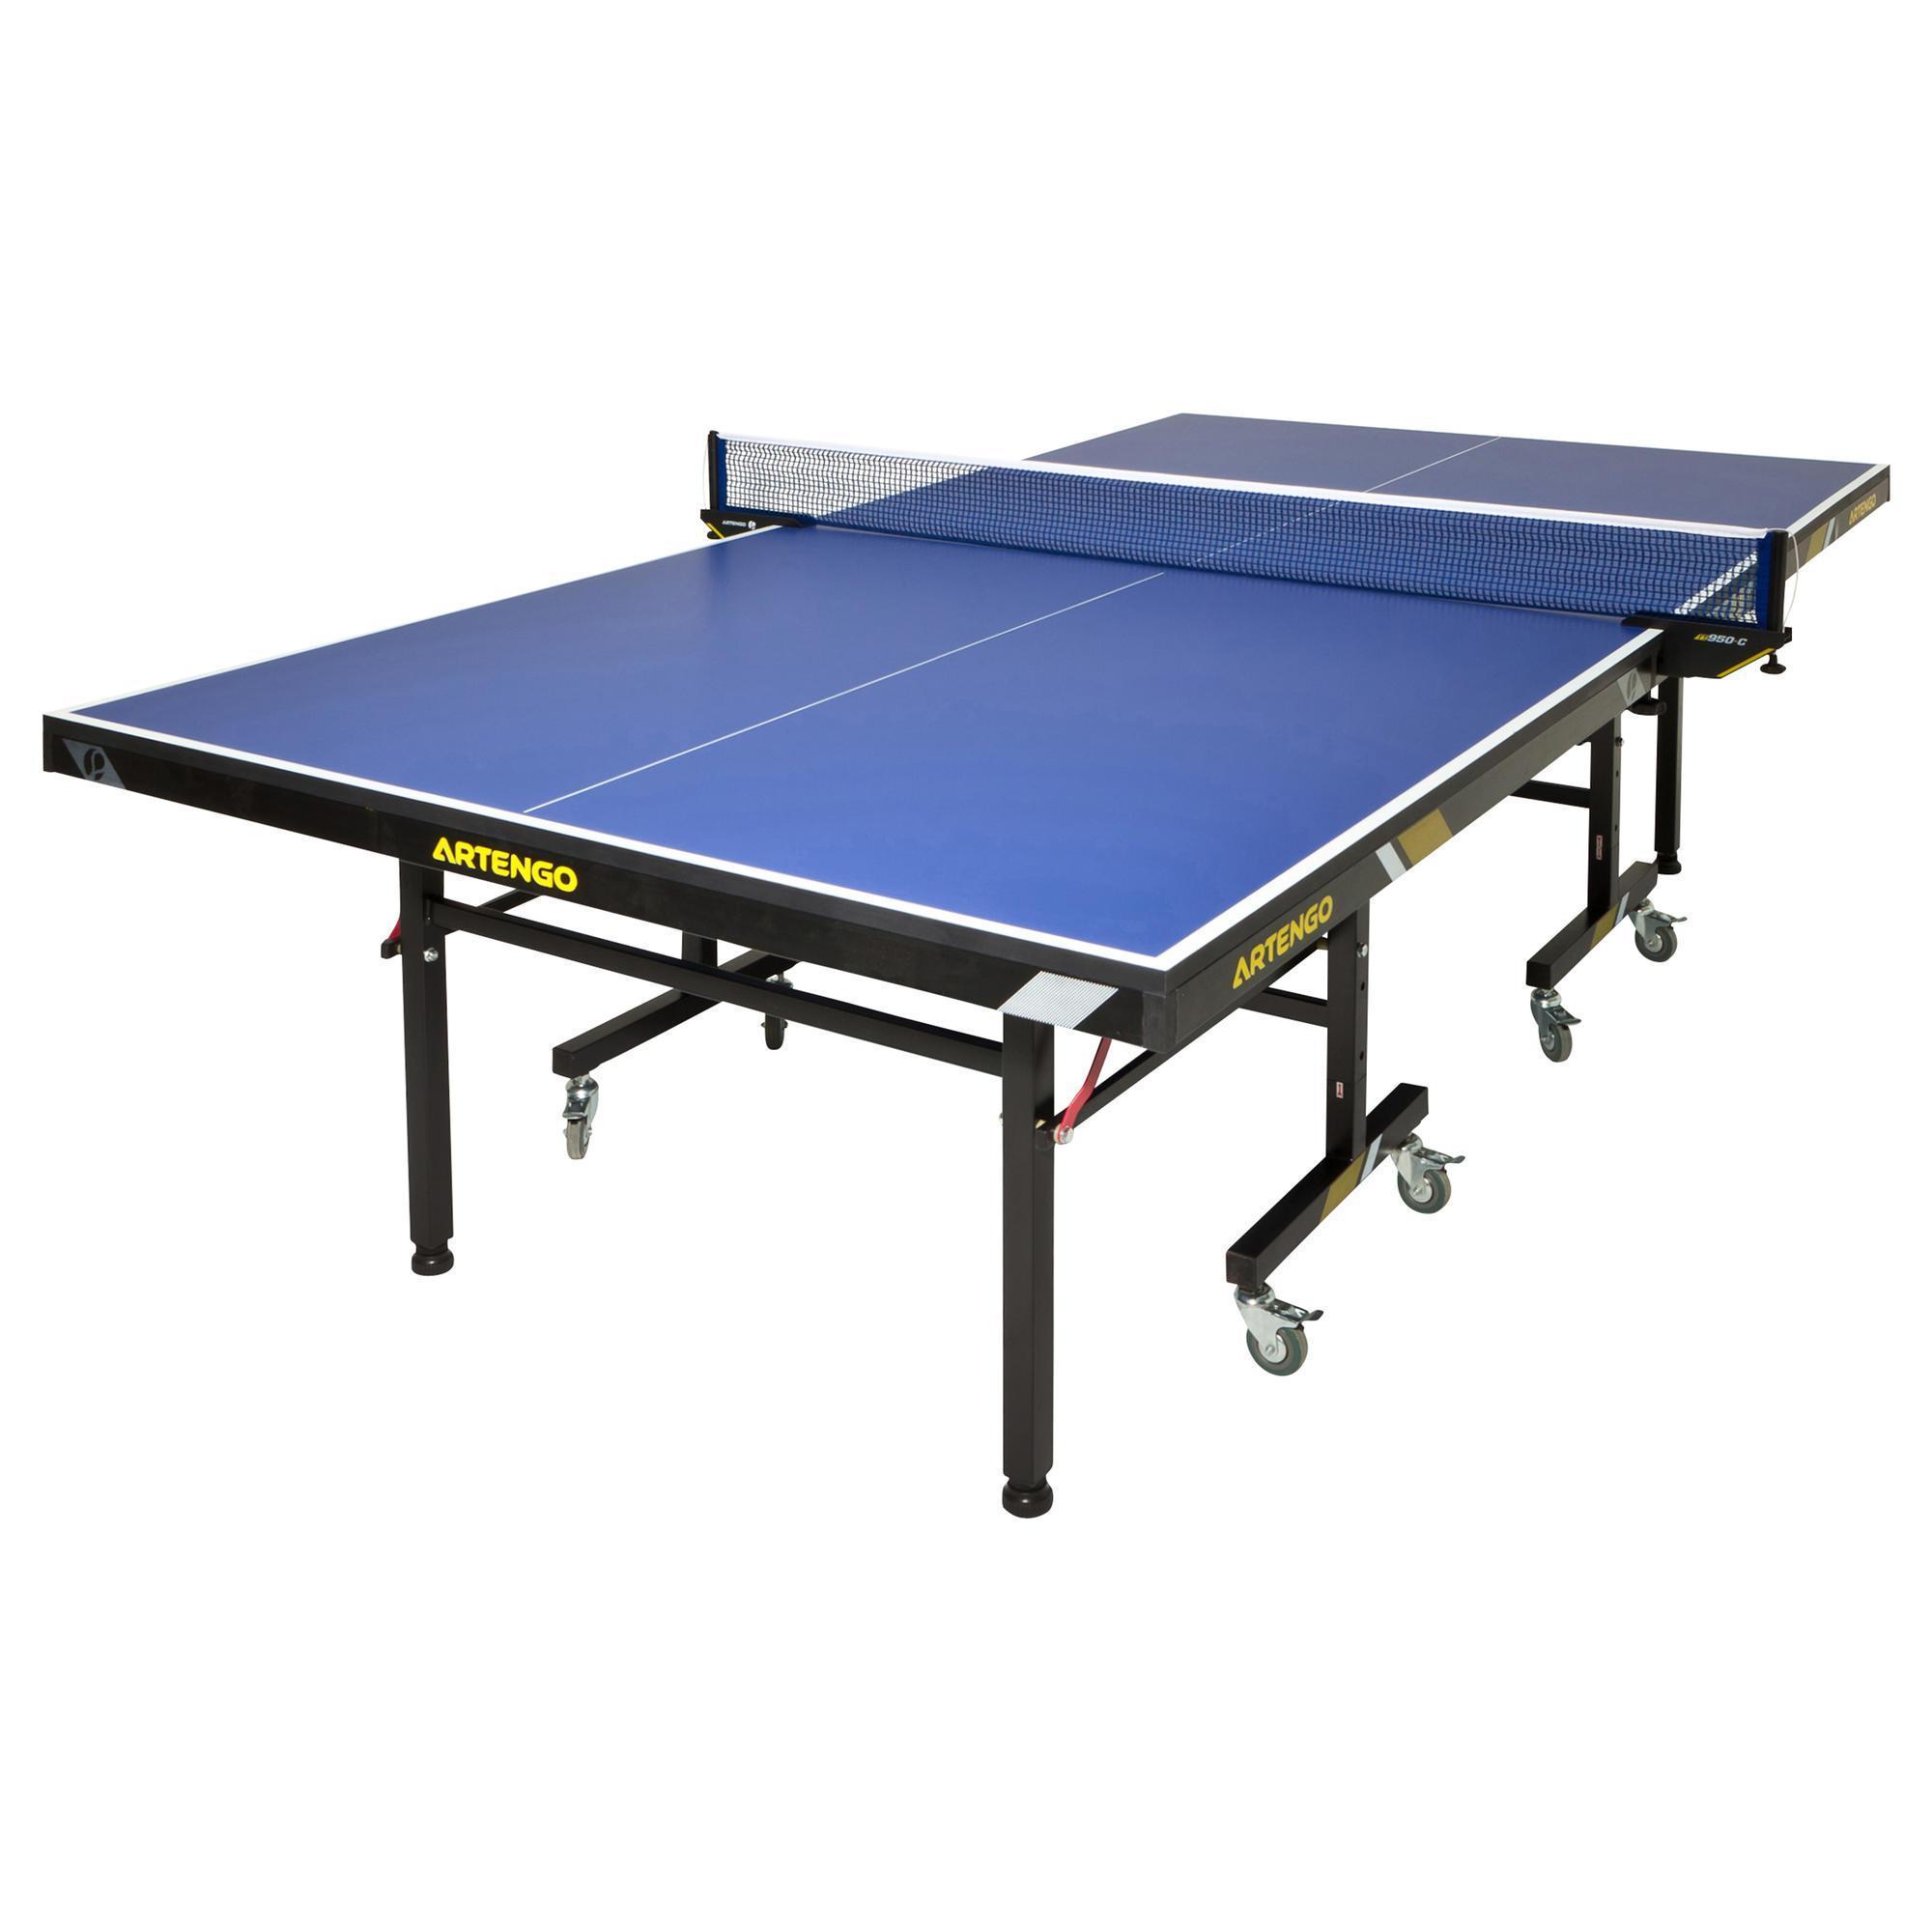 Tavolo ping pong ft950 omologato fftt azzurro artengo - Tavolo ping pong artengo ...